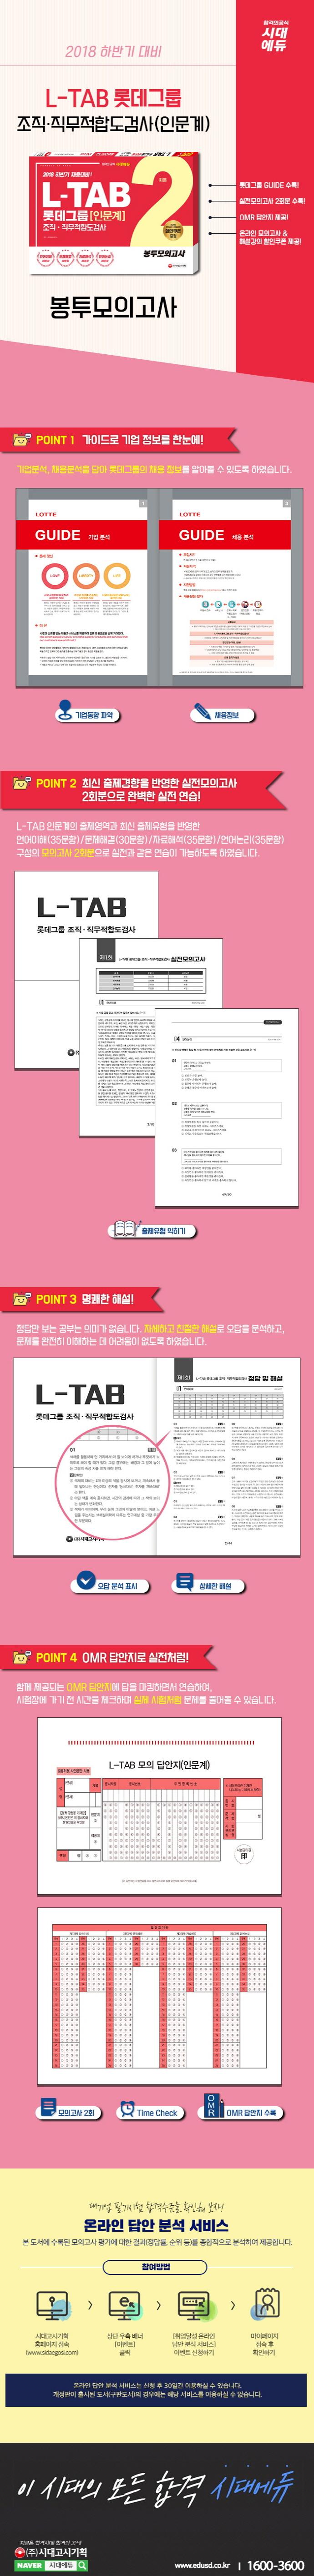 L-TAB 롯데그룹 조직 직무적합도검사 봉투모의고사(인문계)(2018) 도서 상세이미지